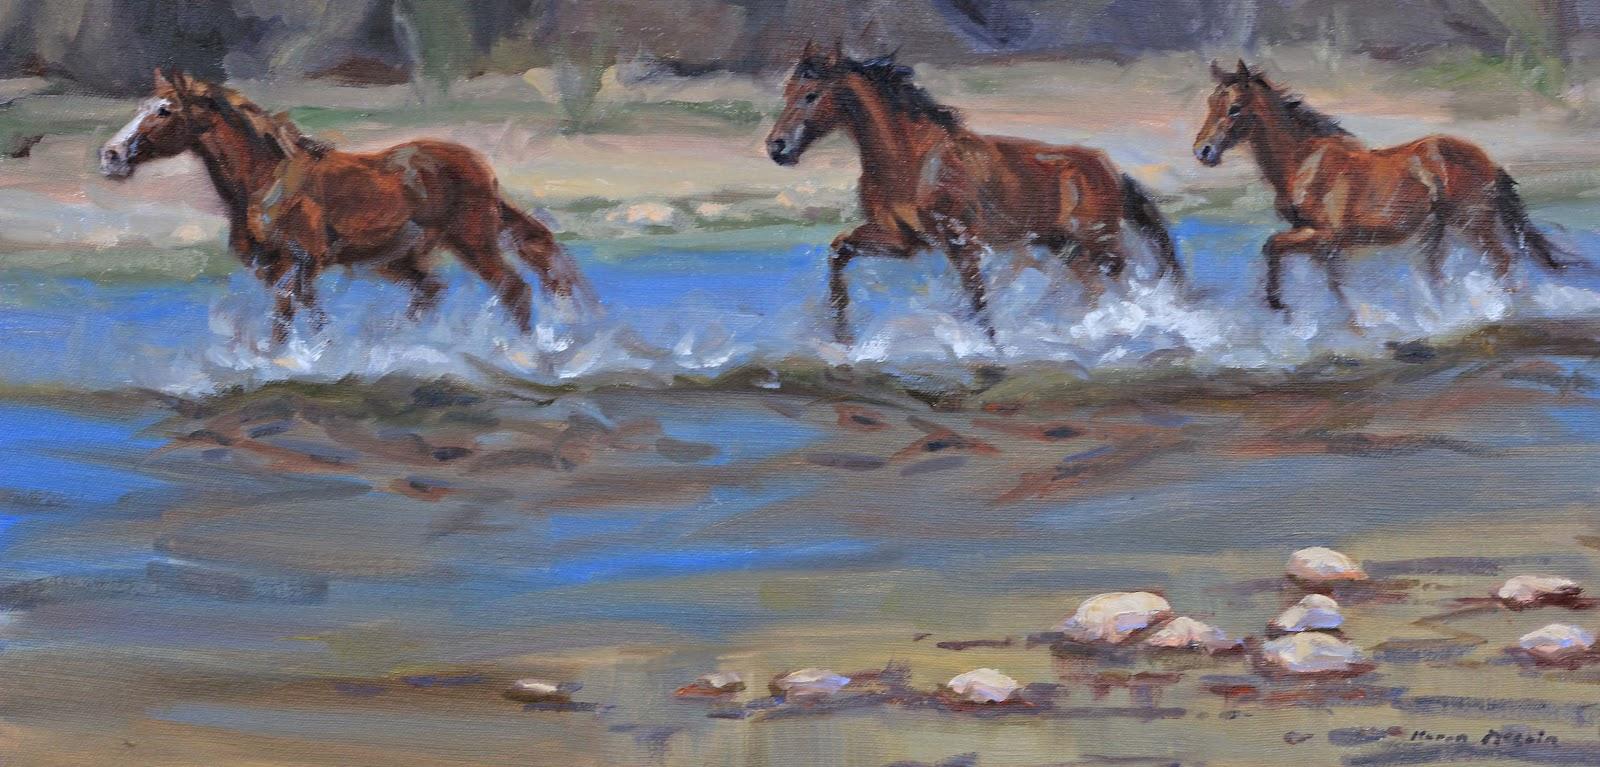 Karen McLain Studio: Wild Horses, Running Free